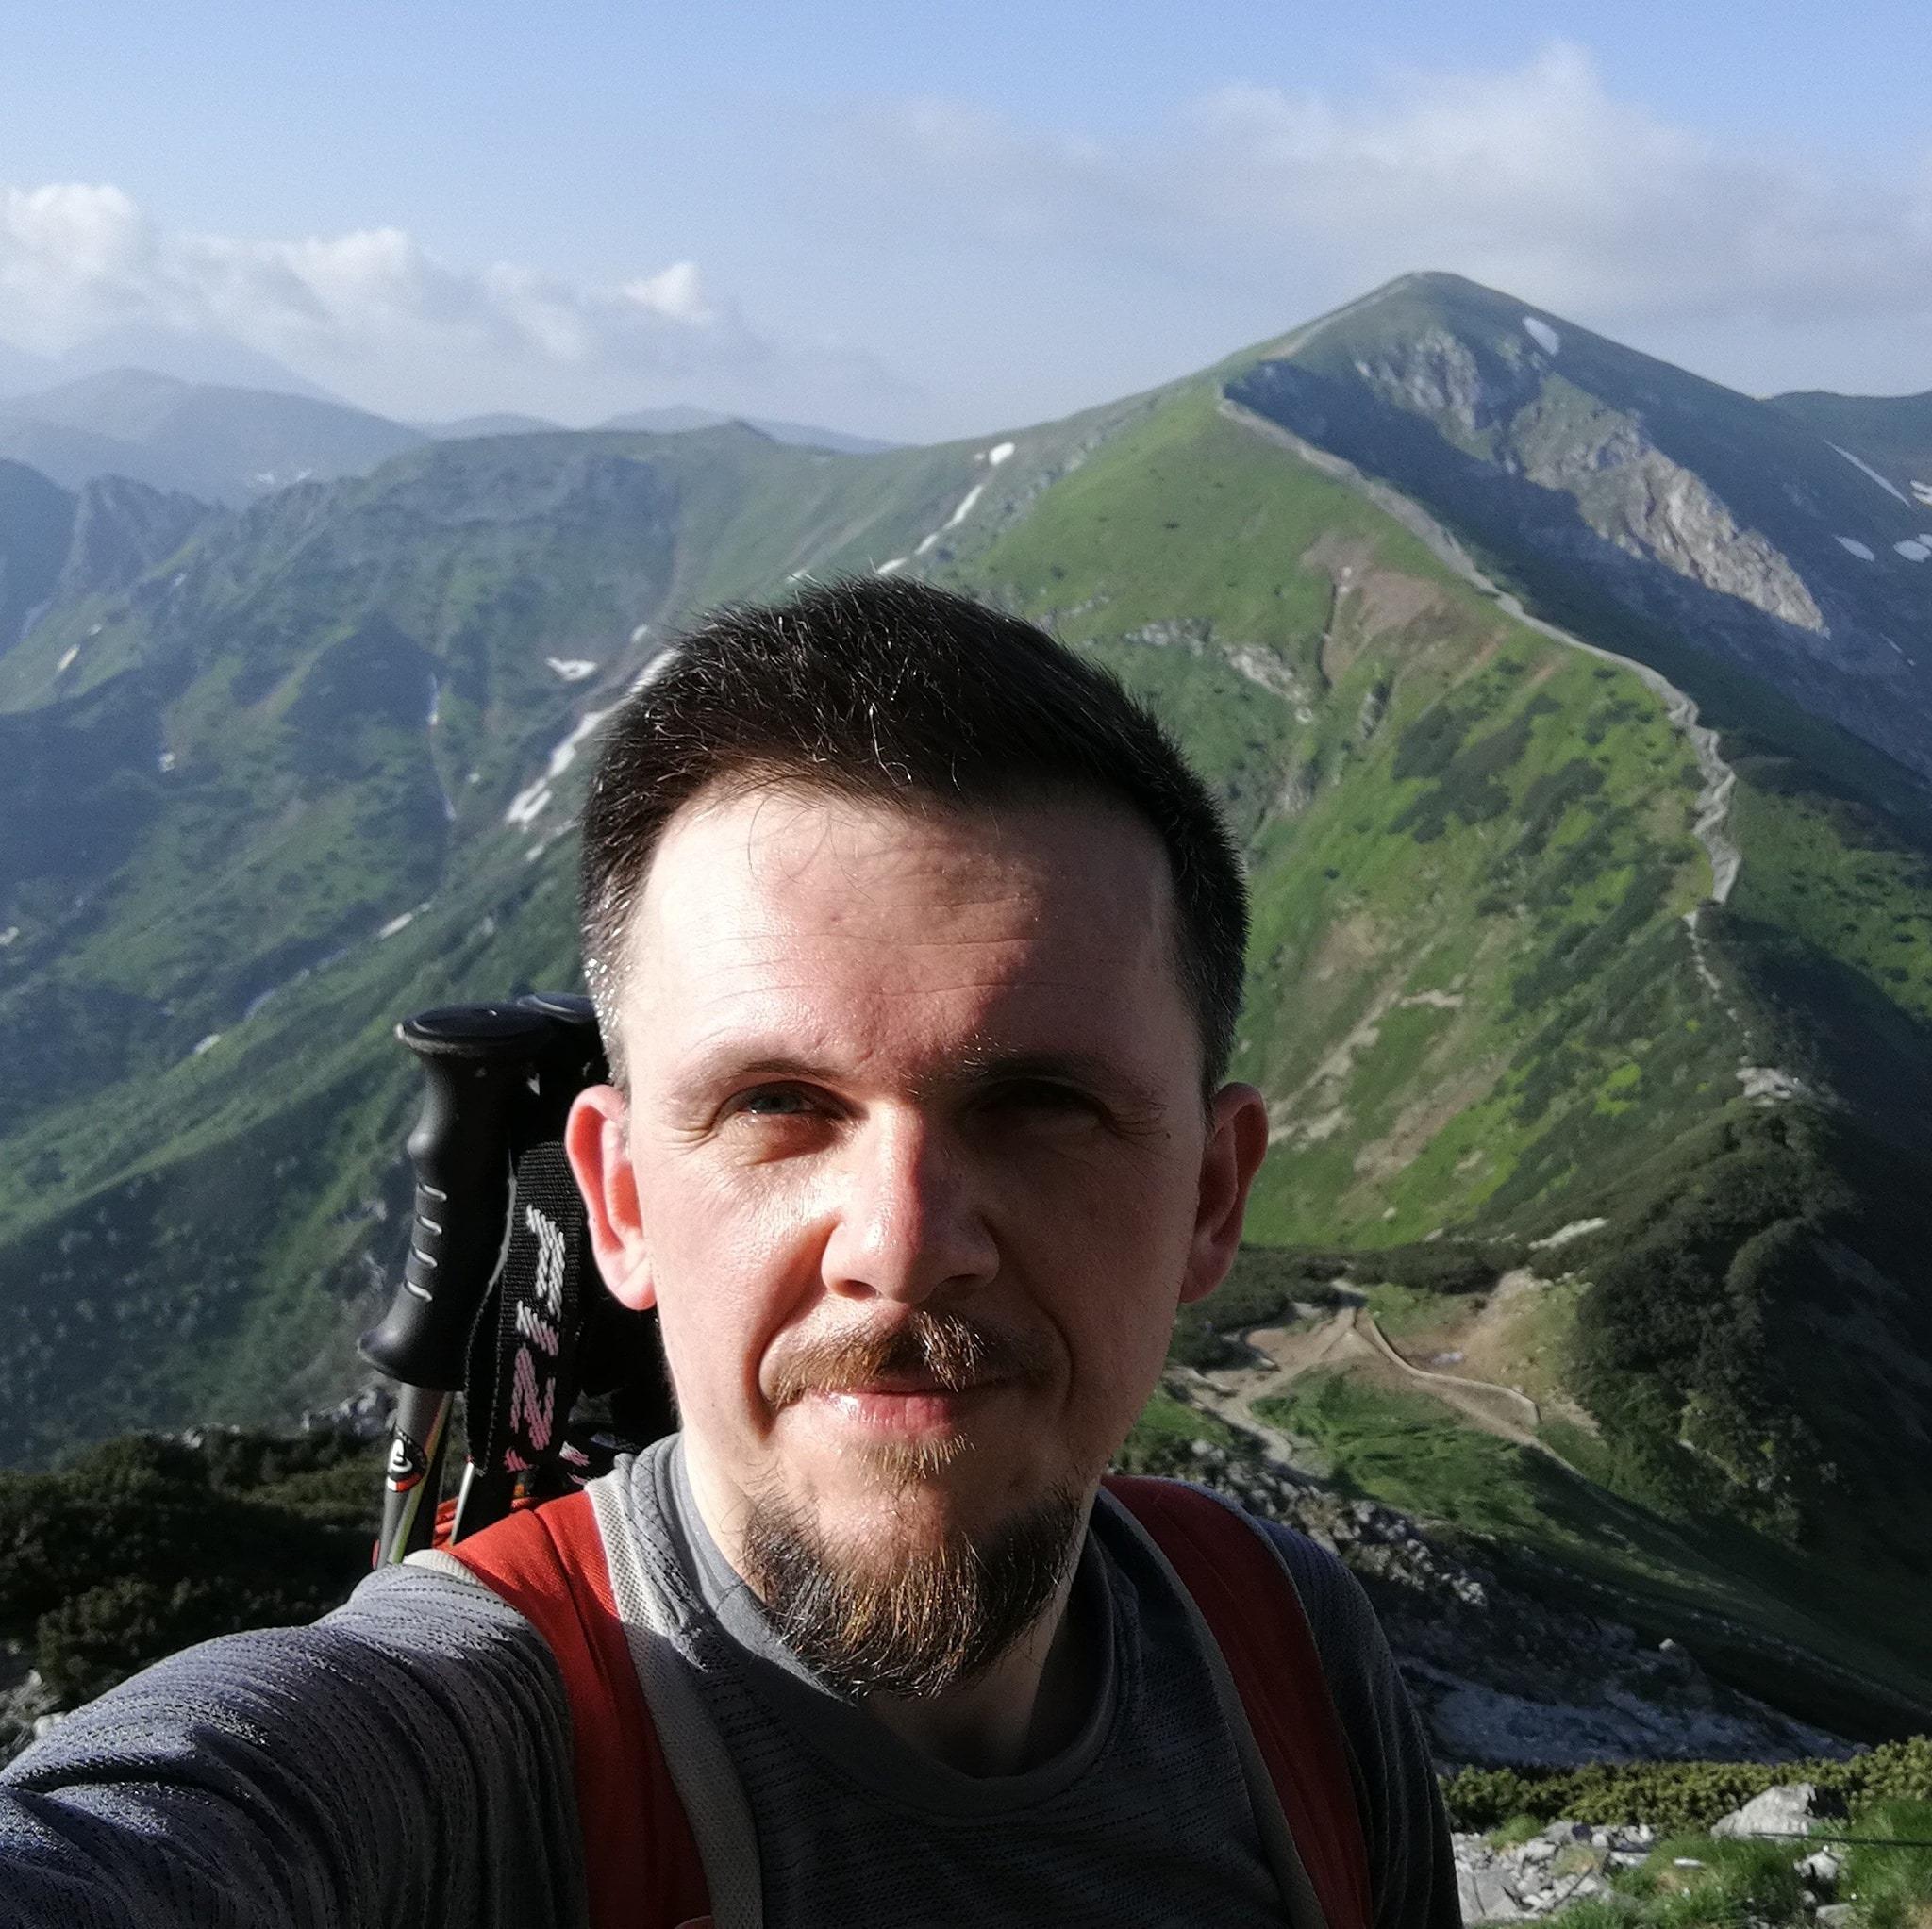 Marek Jaworek